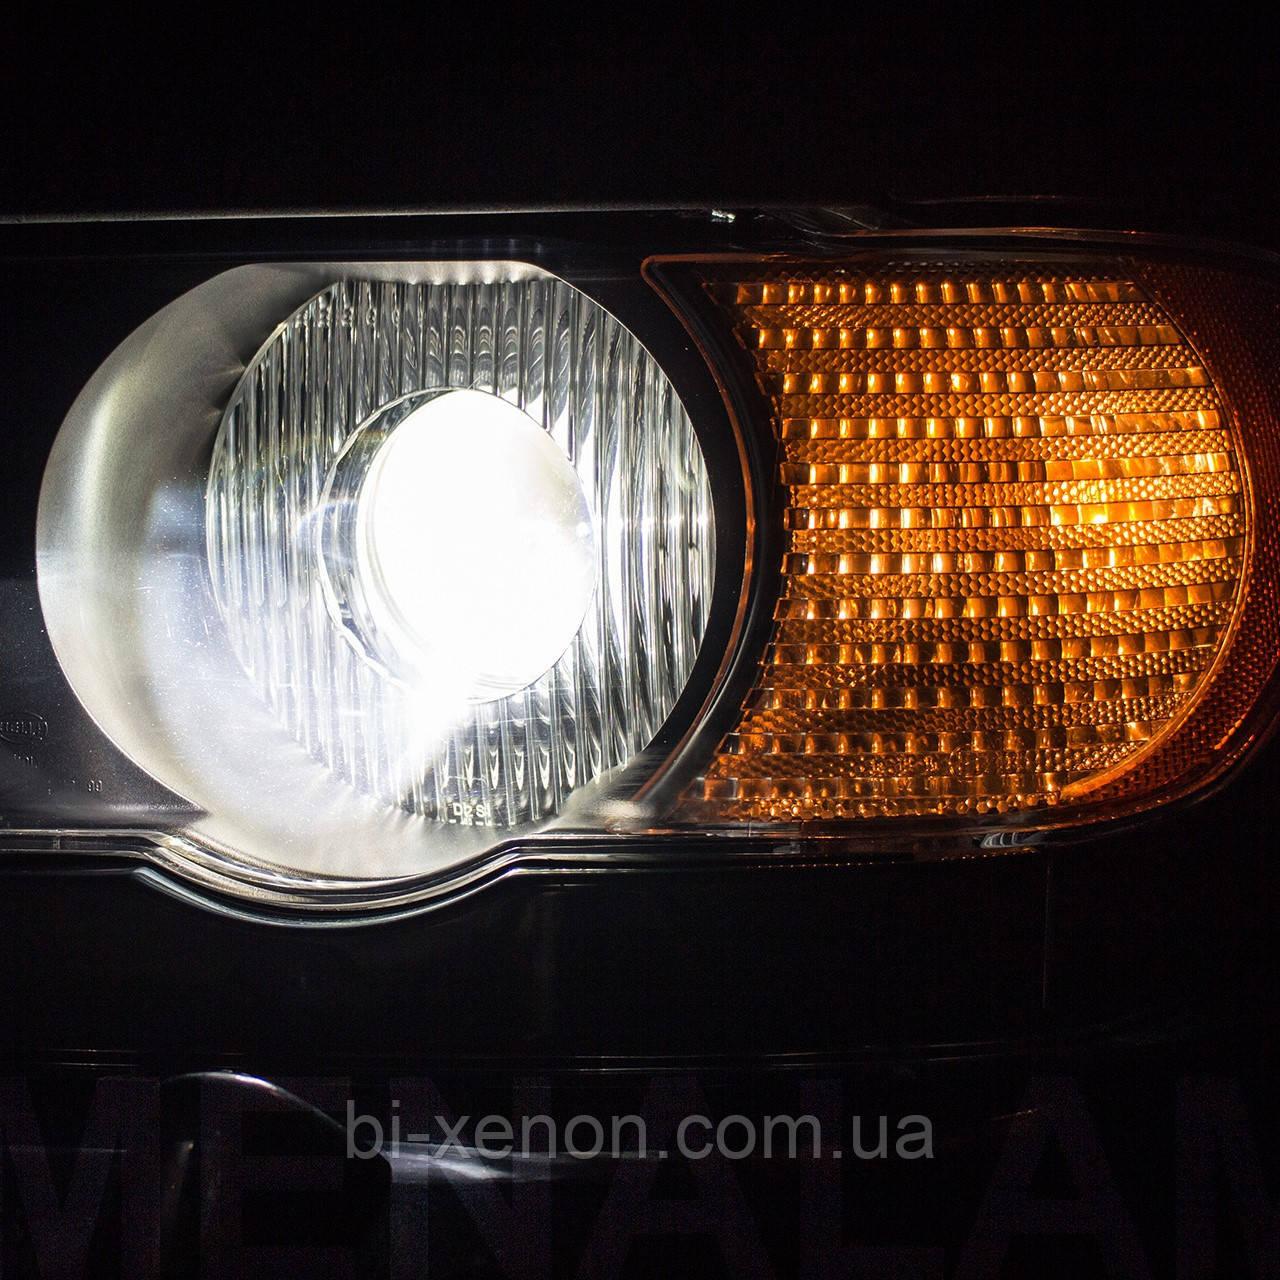 BMW X5 (E53) замена штатных линз